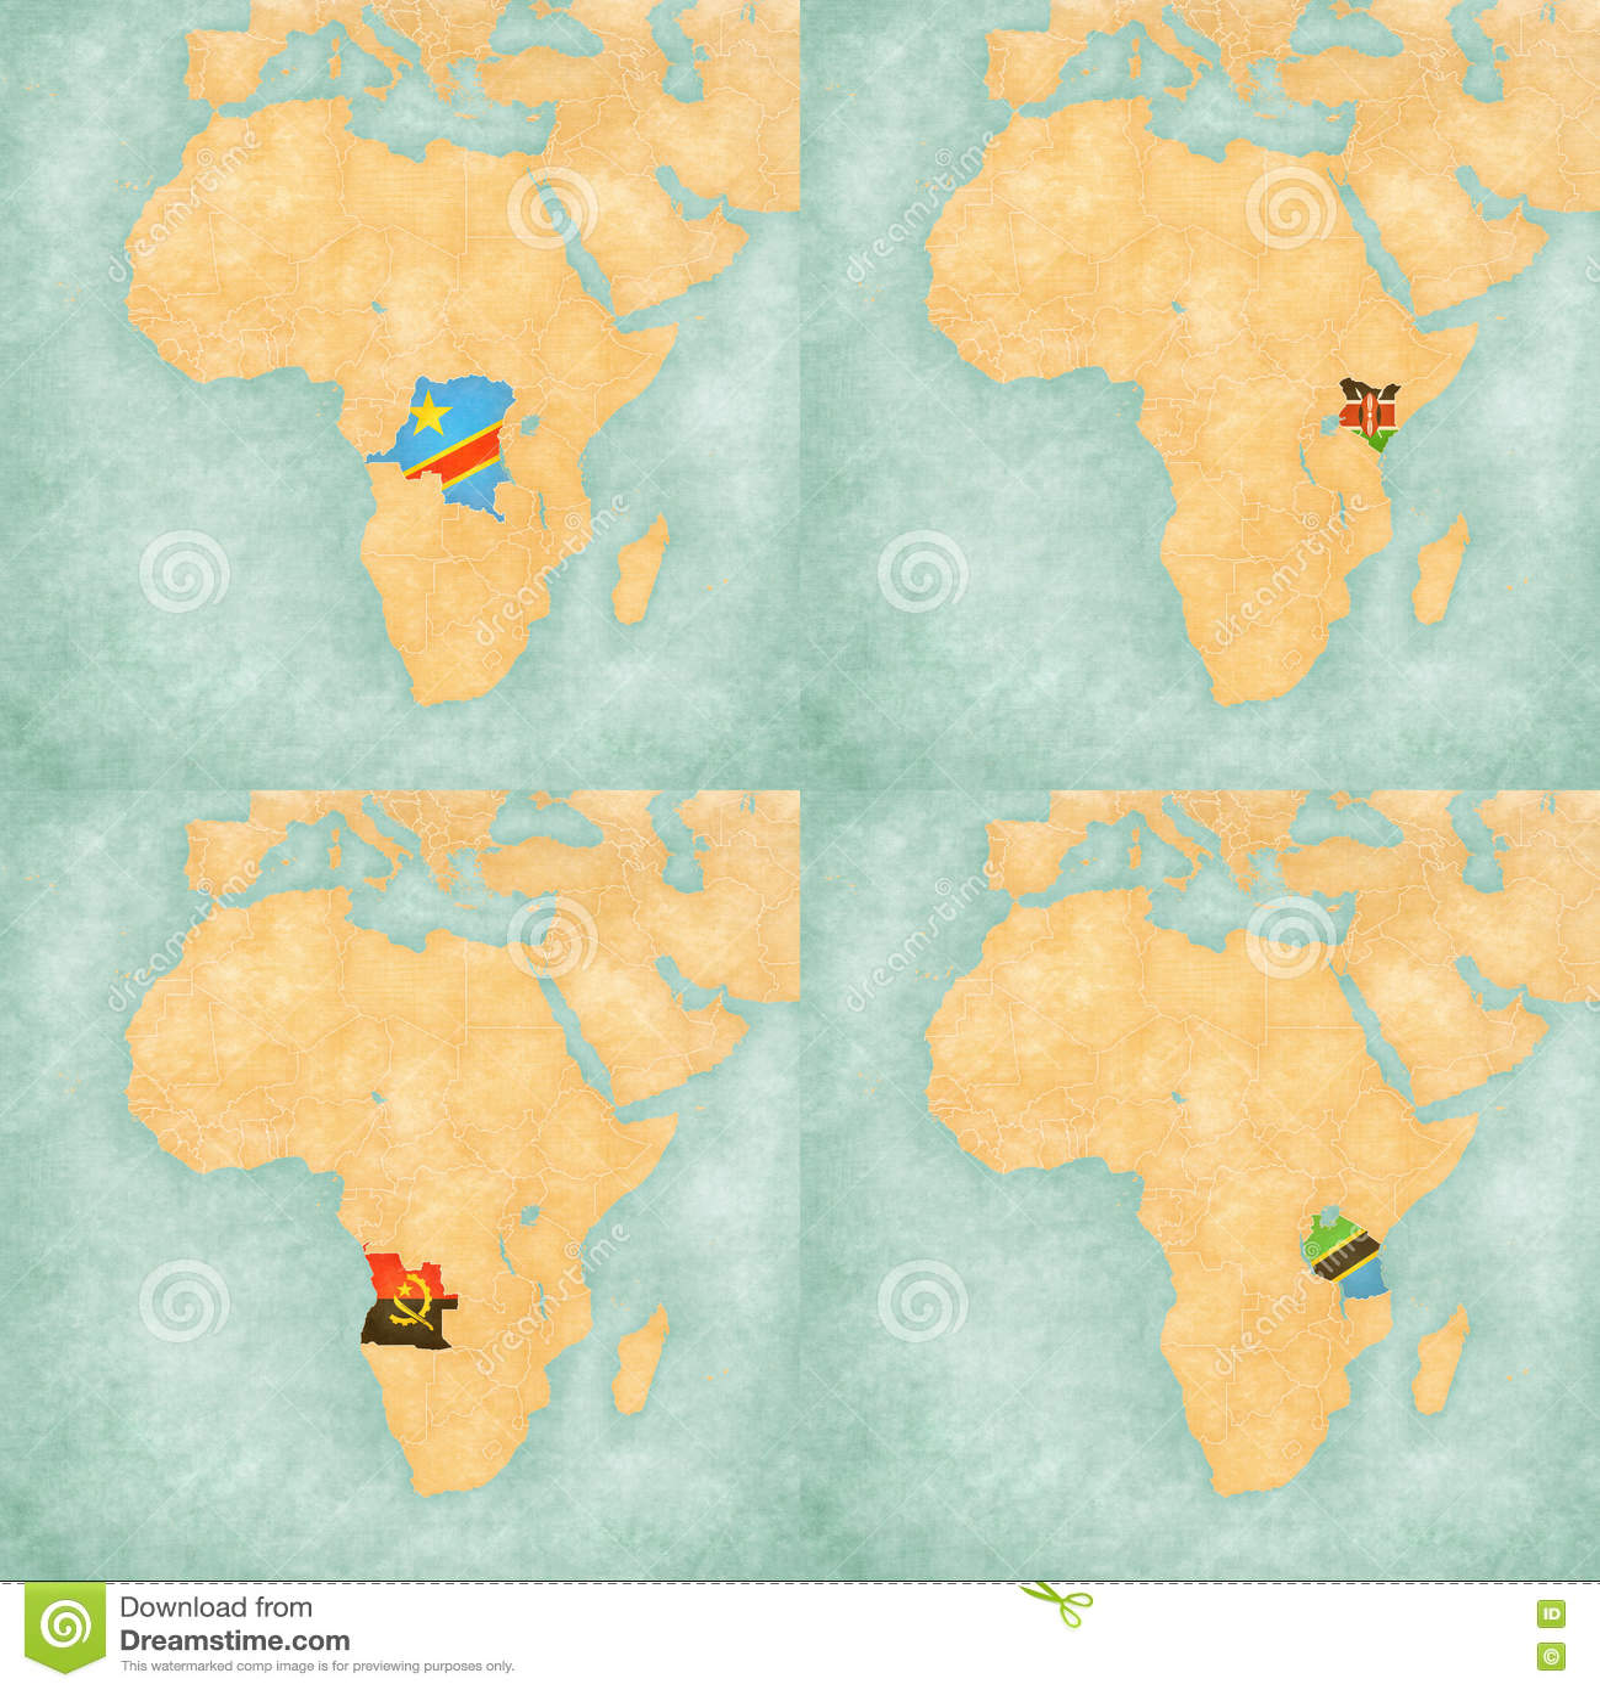 Tanzania On A Map Of Africa.Map Of Africa Dr Congo Kenya Angola And Tanzania Stock